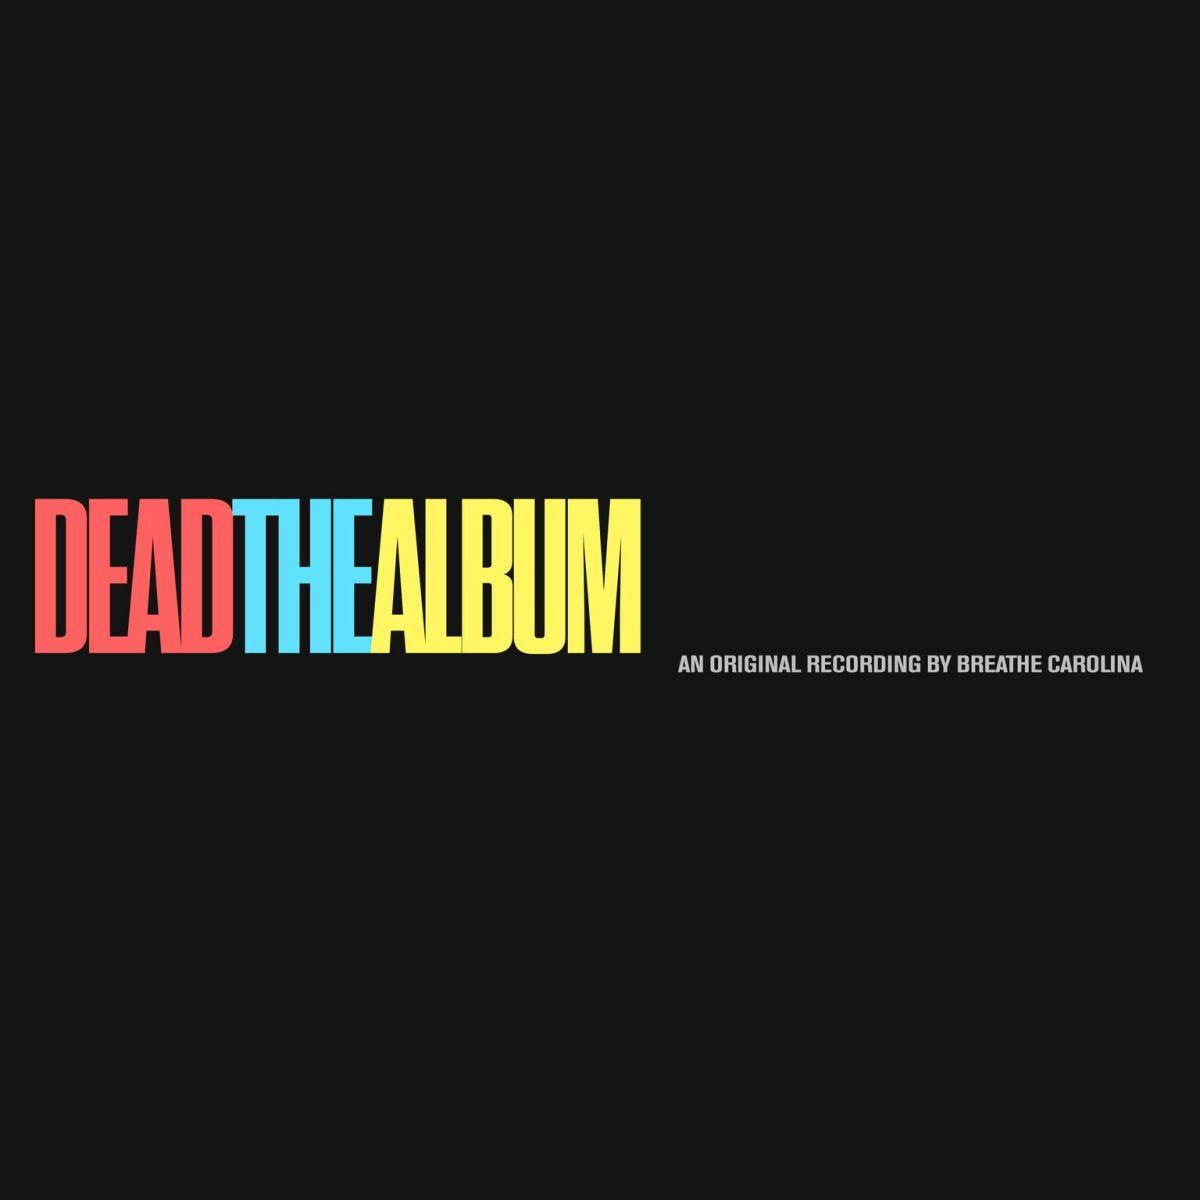 Breathe Carolina DEADTHEALBUM LP